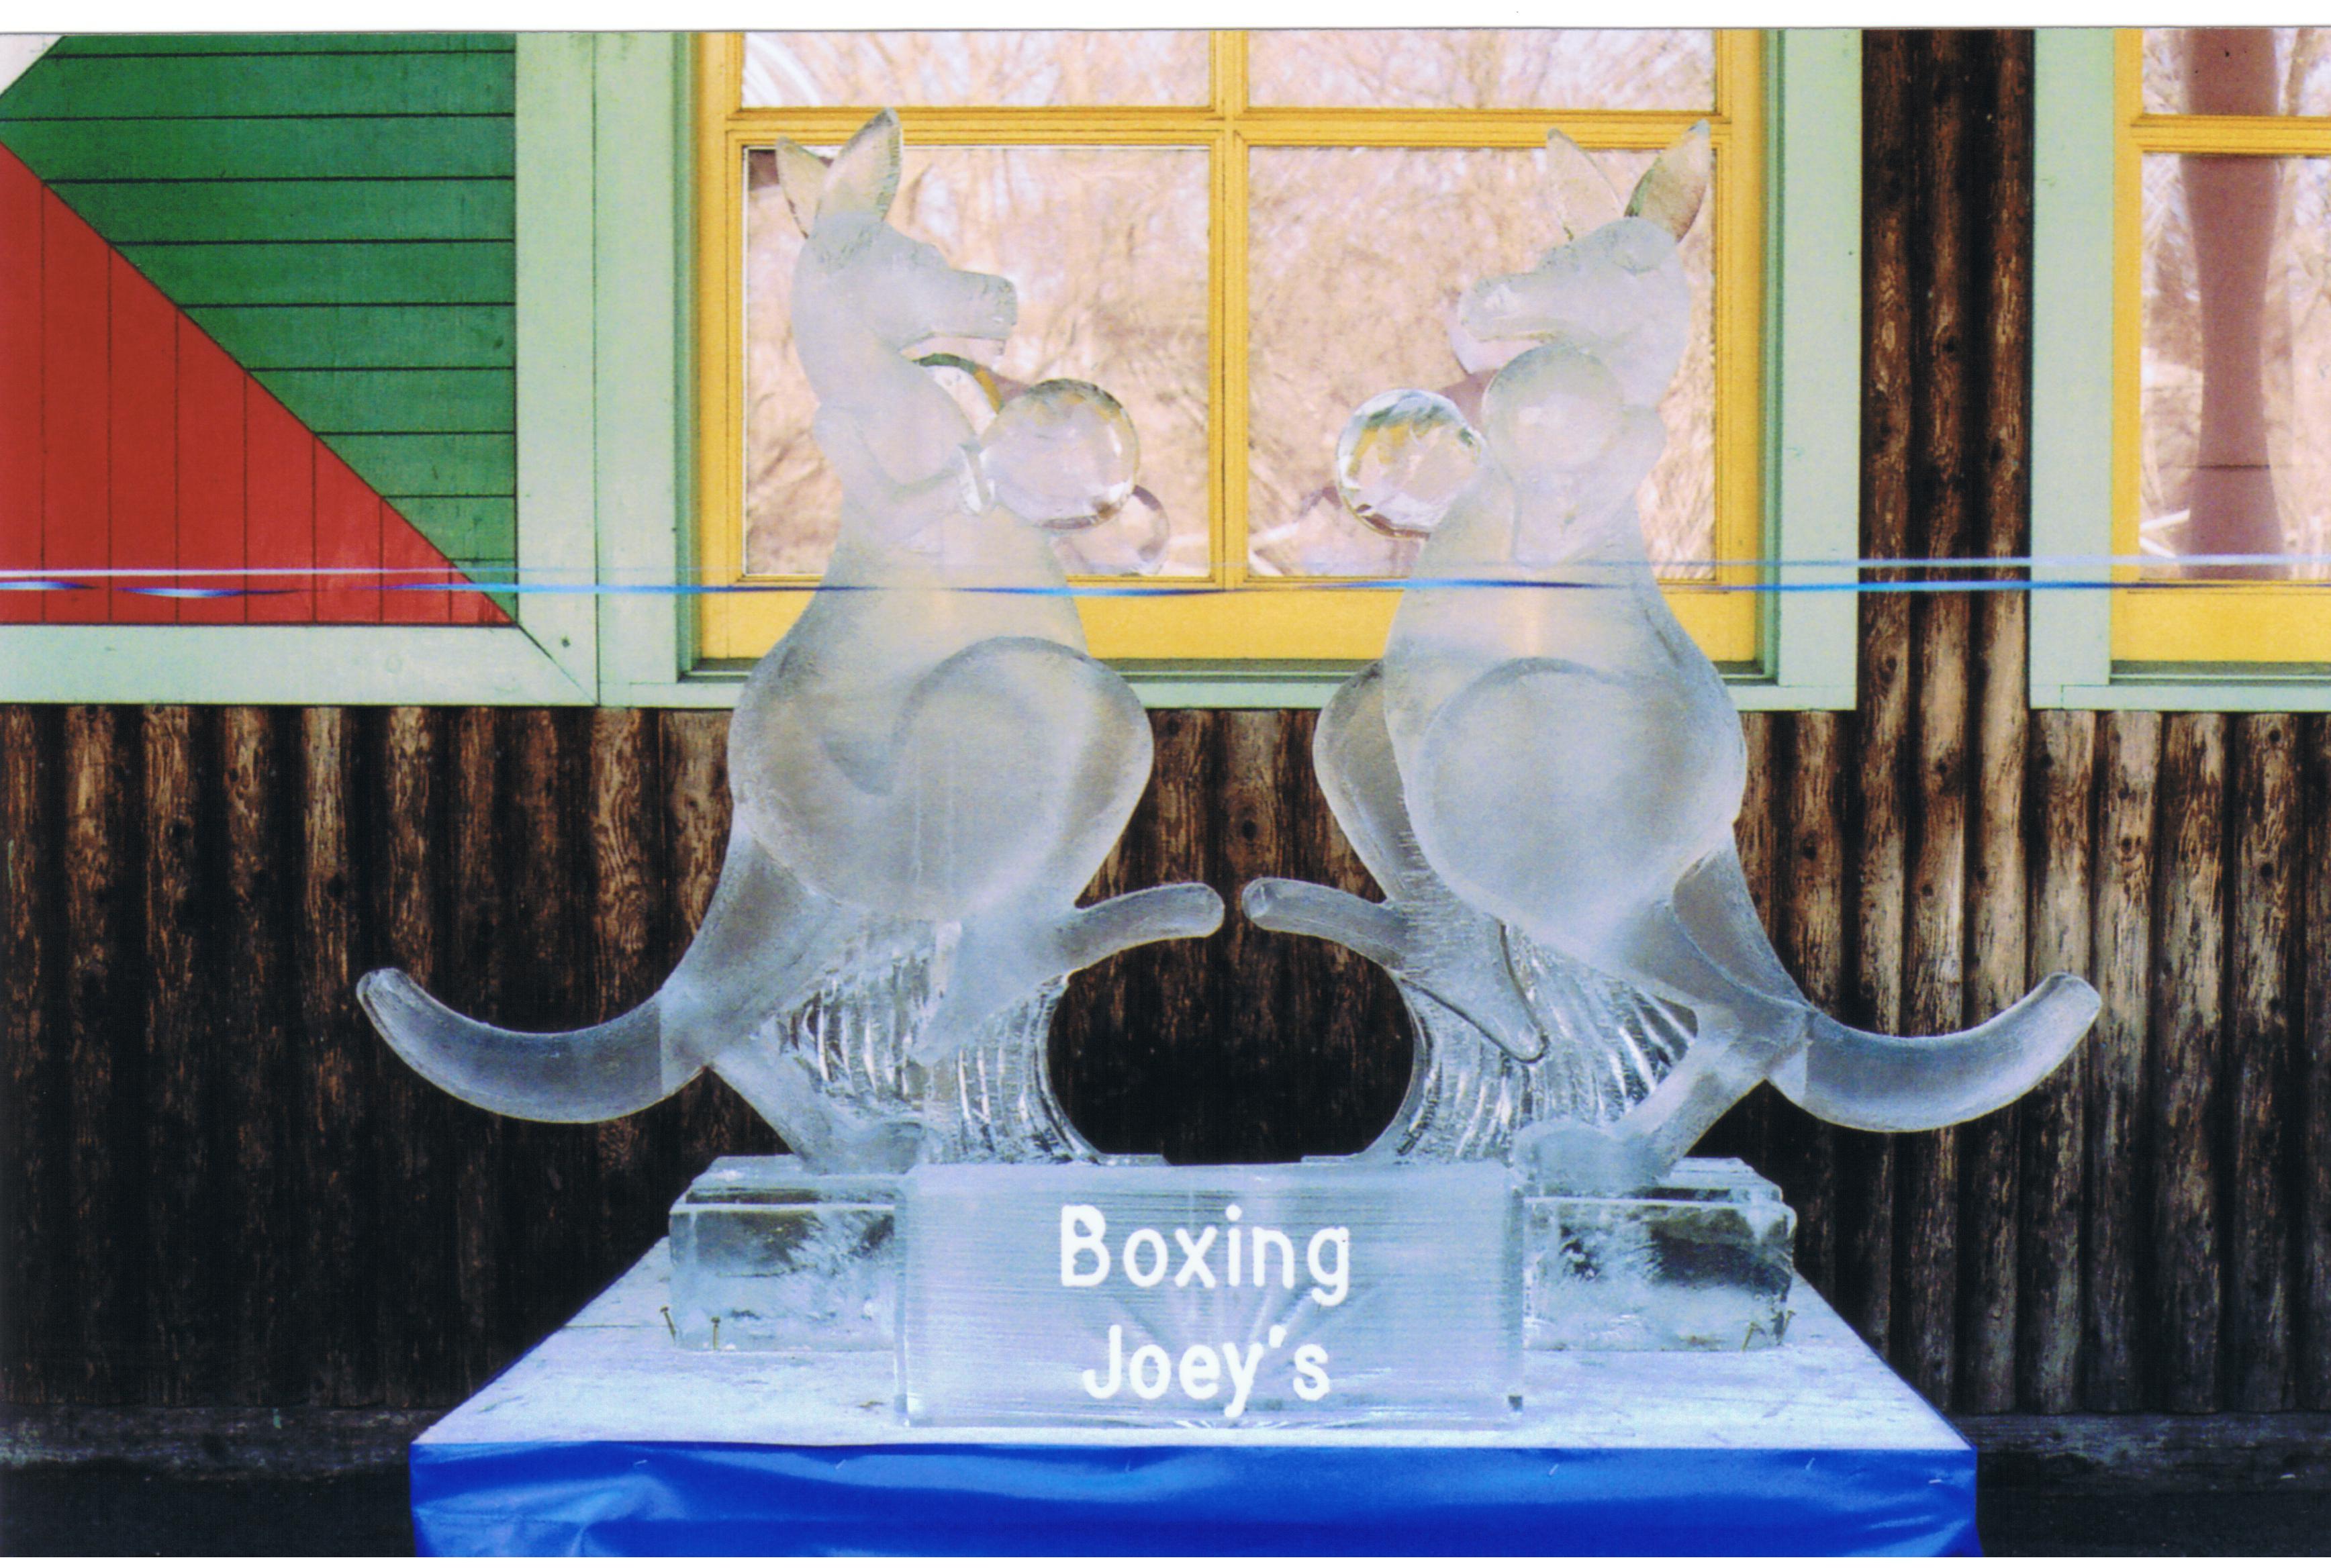 Boxing Joeys